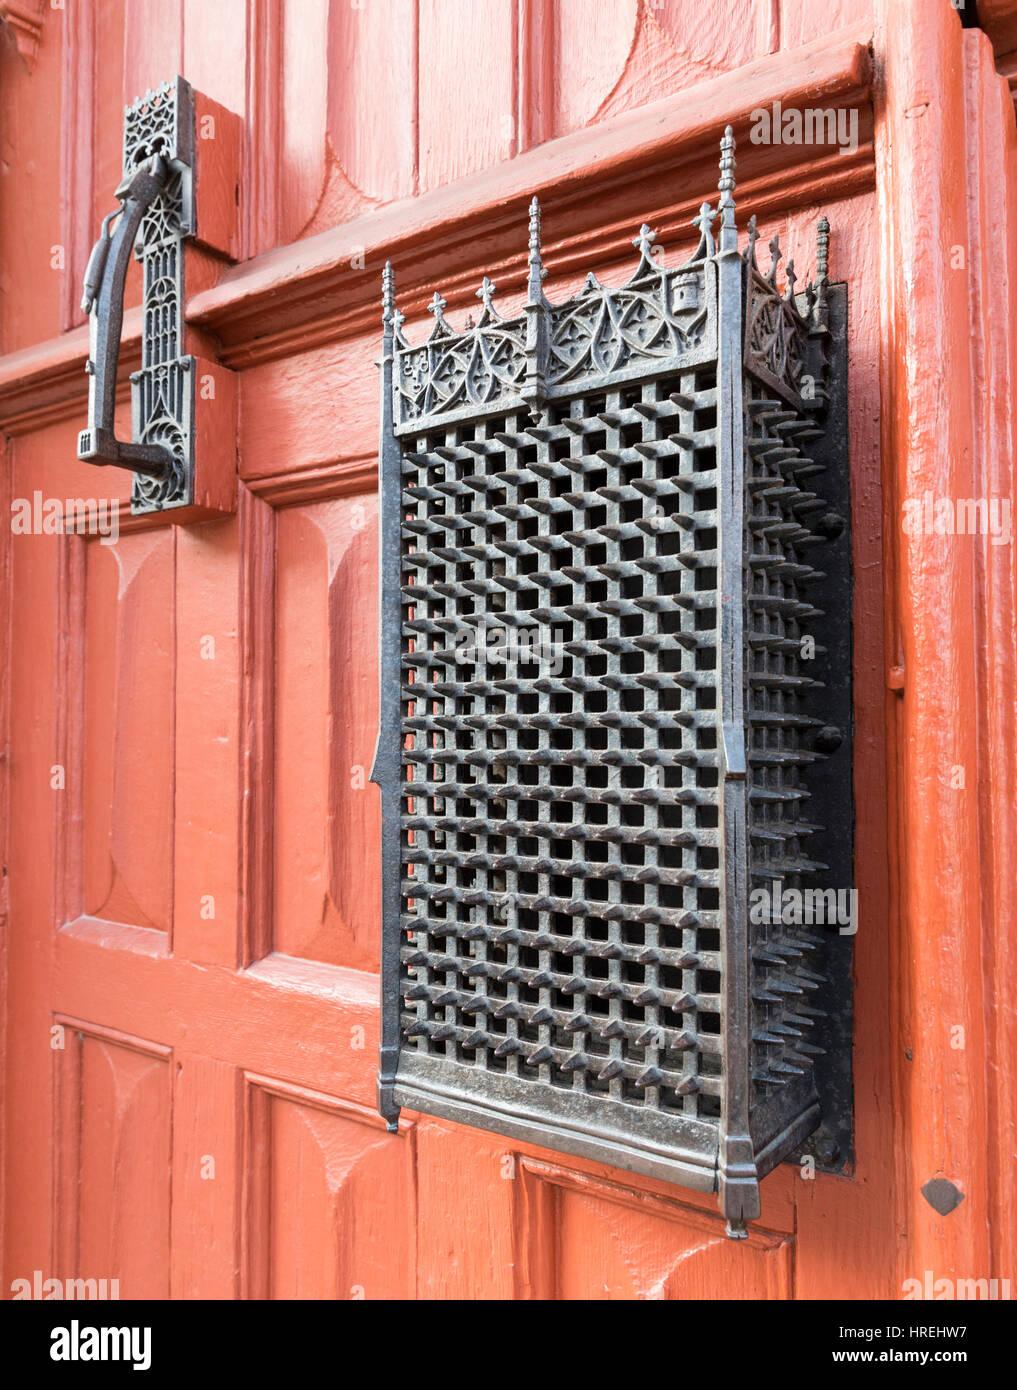 Red front door of Hotel-Dieu, Beaune, Burgundy, France - Stock Image